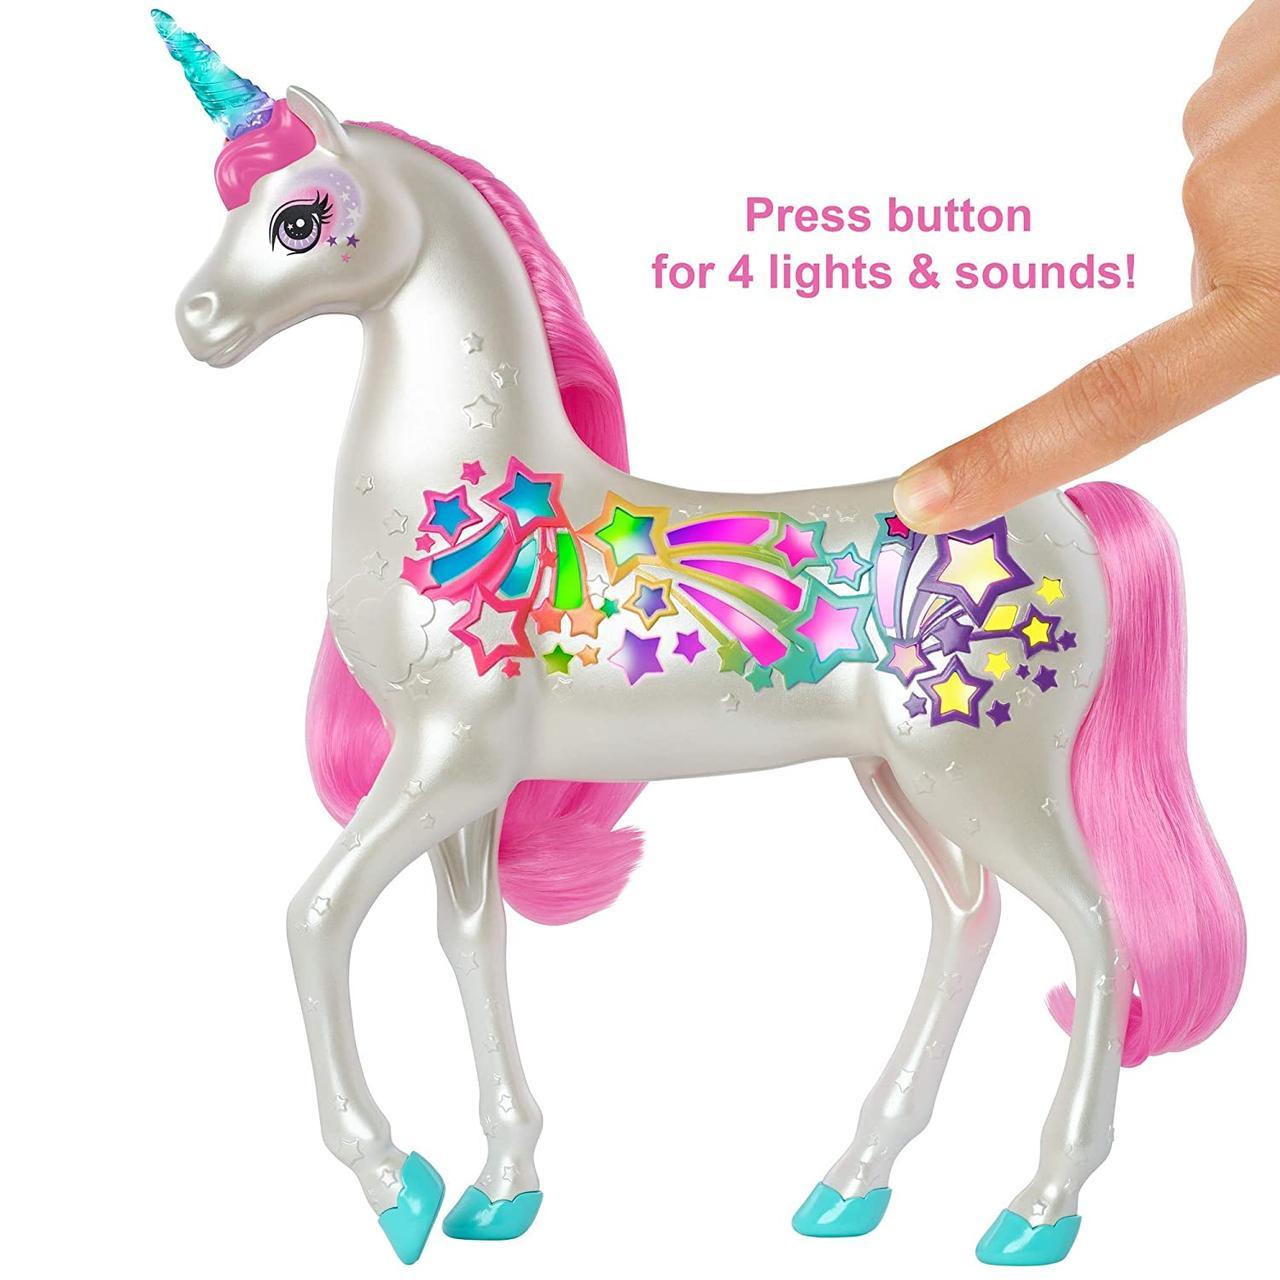 Barbie Dreamtopia Мерехтливий єдиноріг (мерцающий единорог)Magic Hair Game Unicorn Mattel GFH60